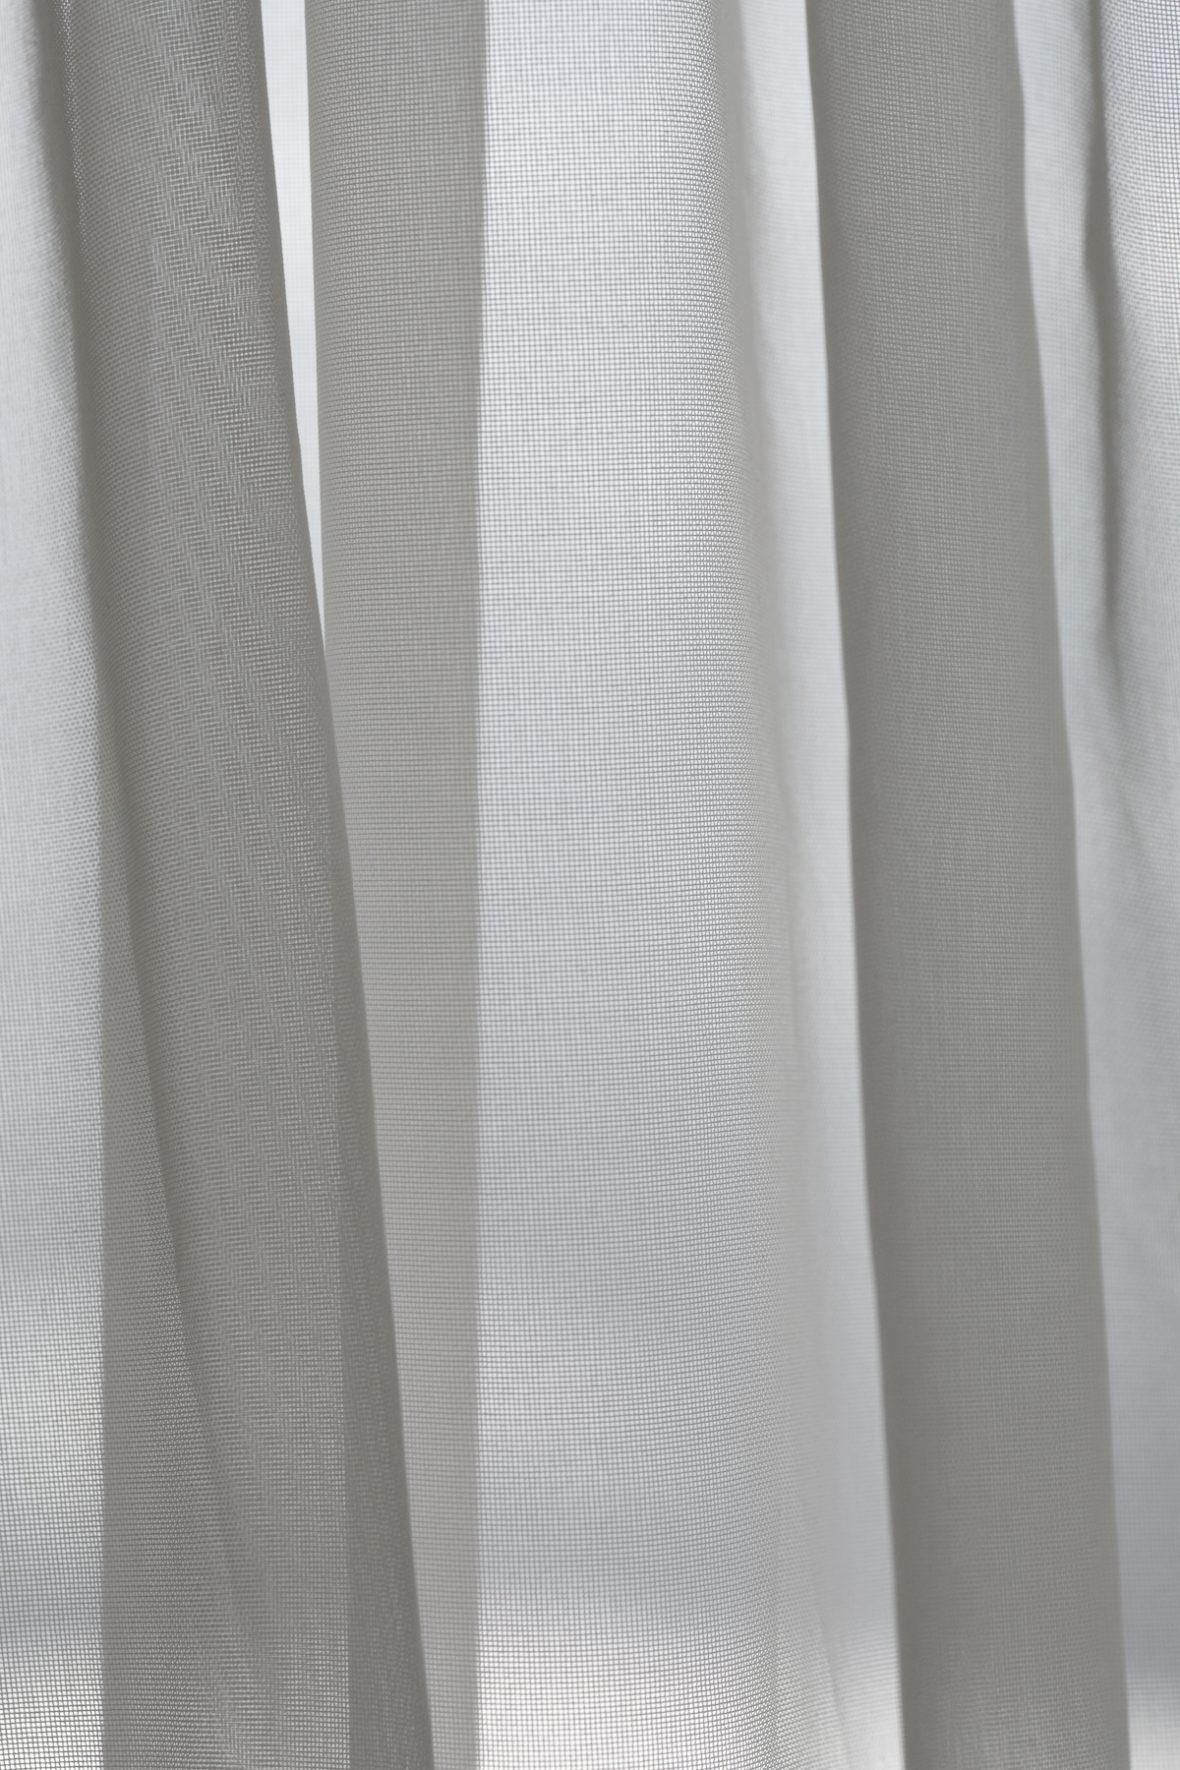 Privacy, 2008, Pigmentprint, 90x60cm